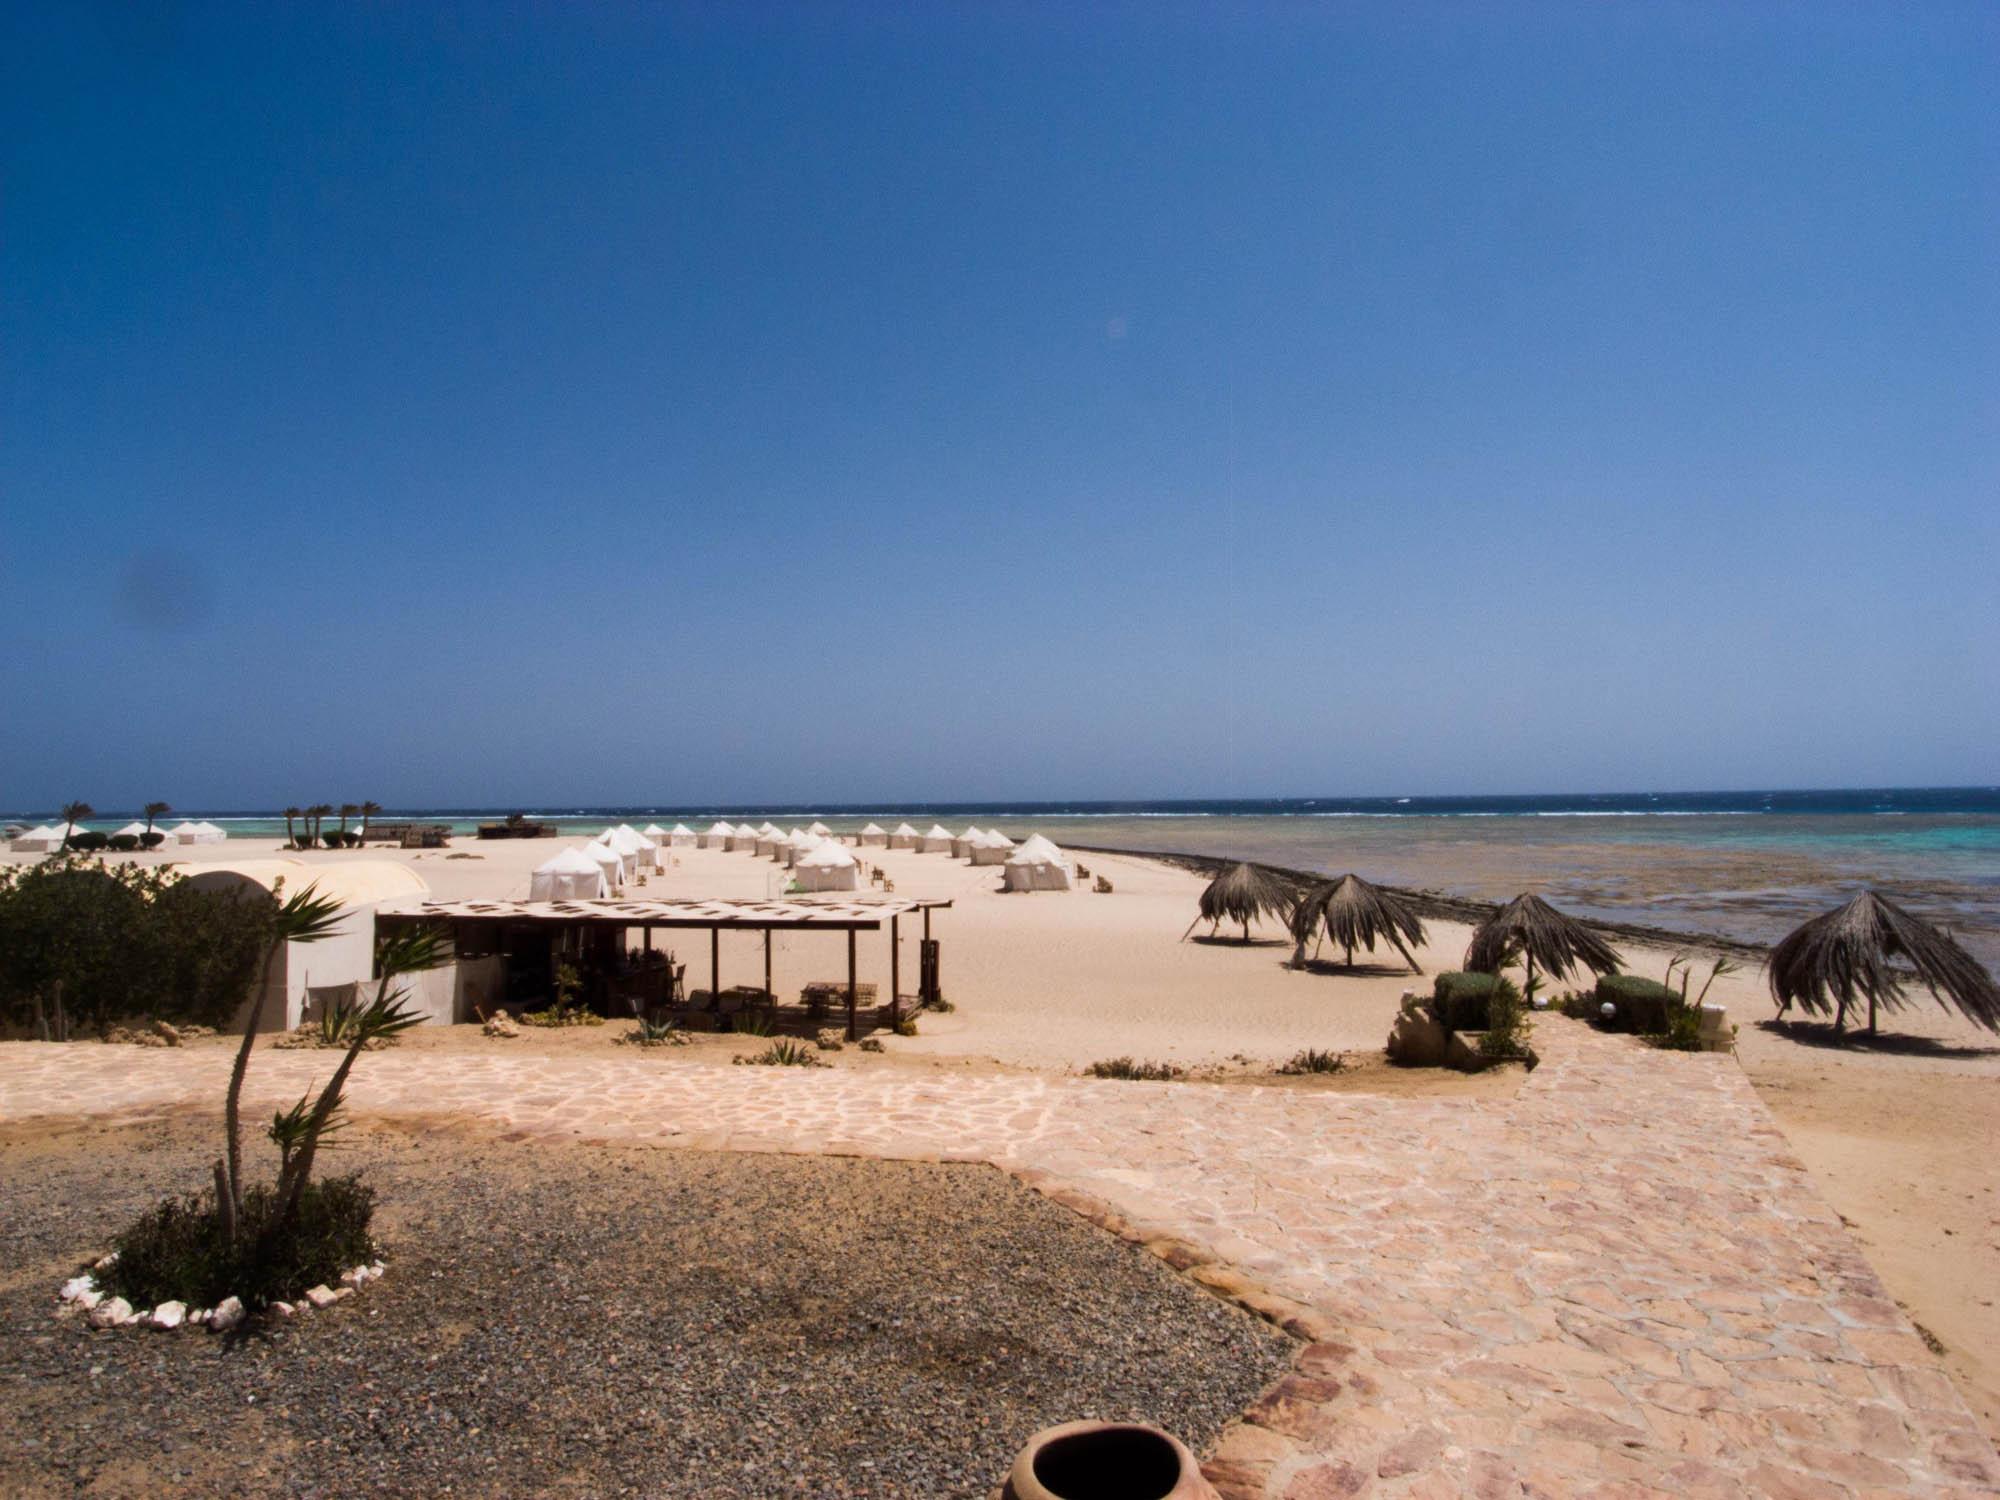 Marsa_Shagra_Red Sea Diving Safari_Tauchen_Rotes_Meer_Ägypten-18